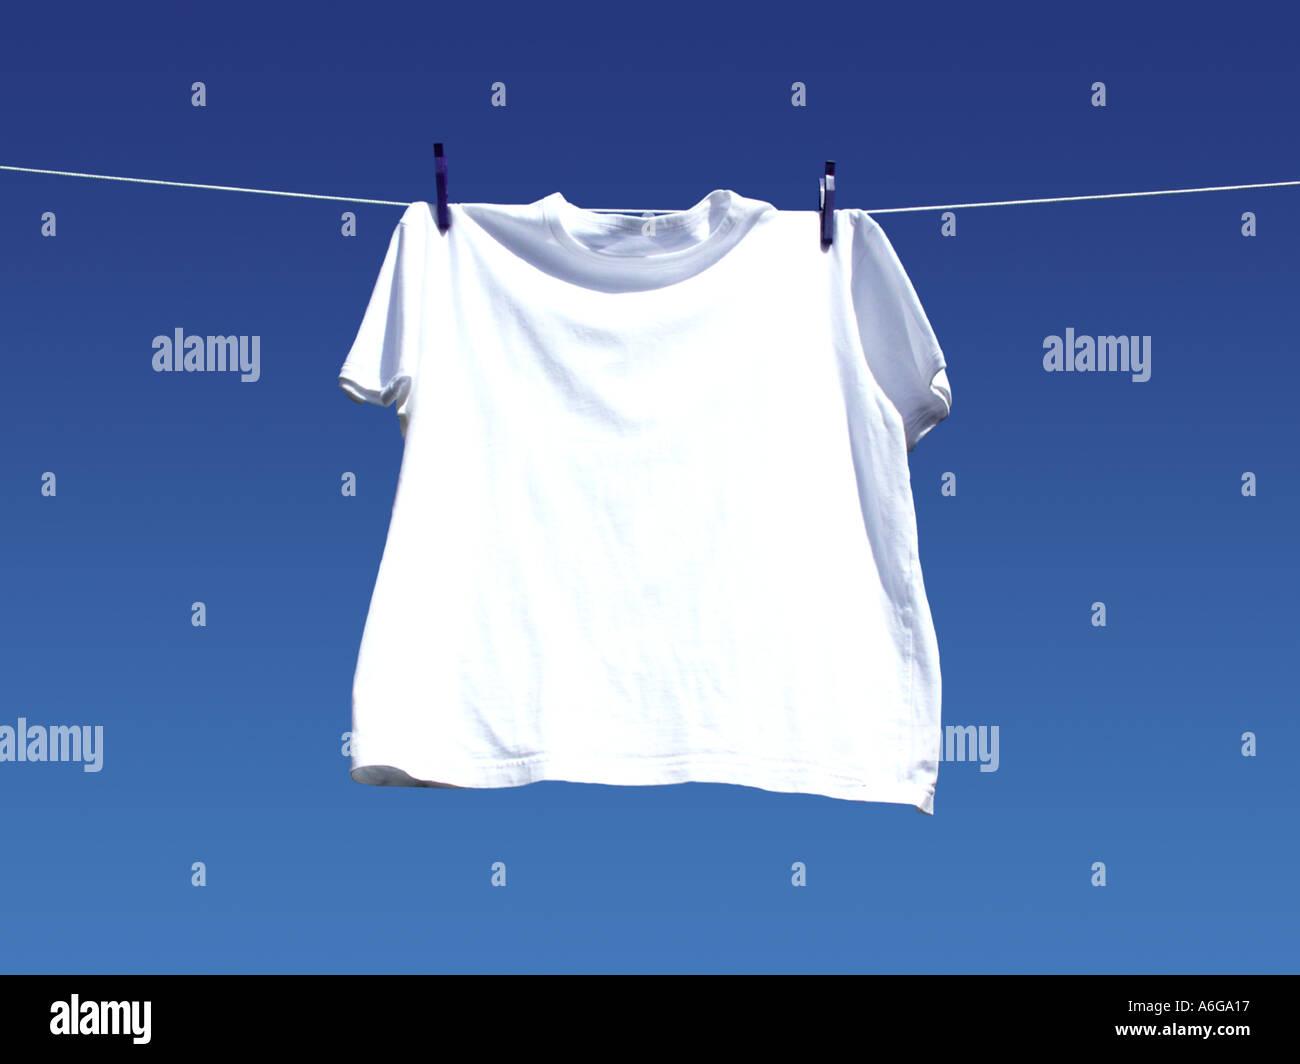 t shirt line washing laundry one 1 single peg white hang. Black Bedroom Furniture Sets. Home Design Ideas